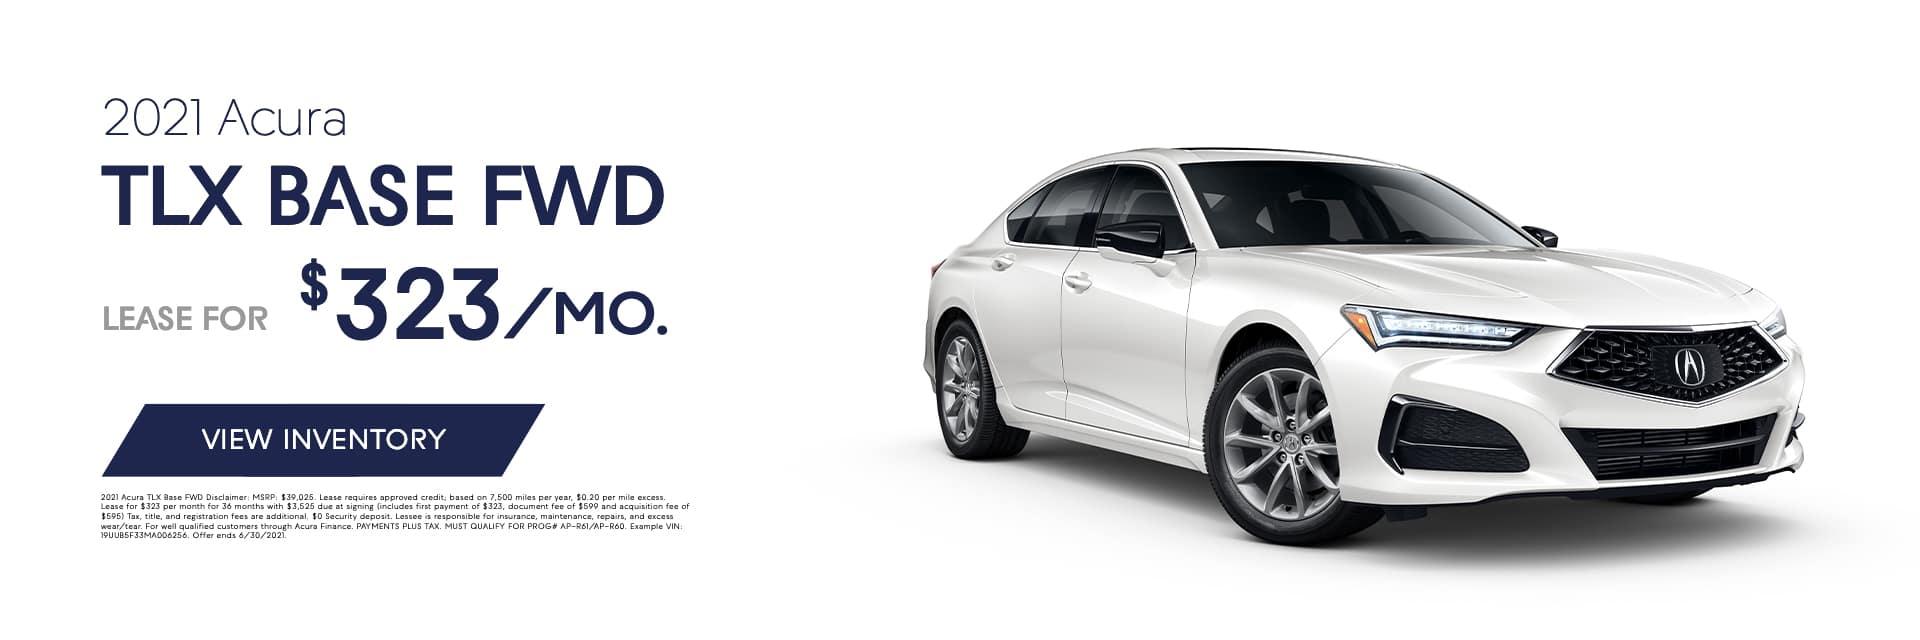 EAG_AOB_Banner_2021 Acura TLX BASE FWD